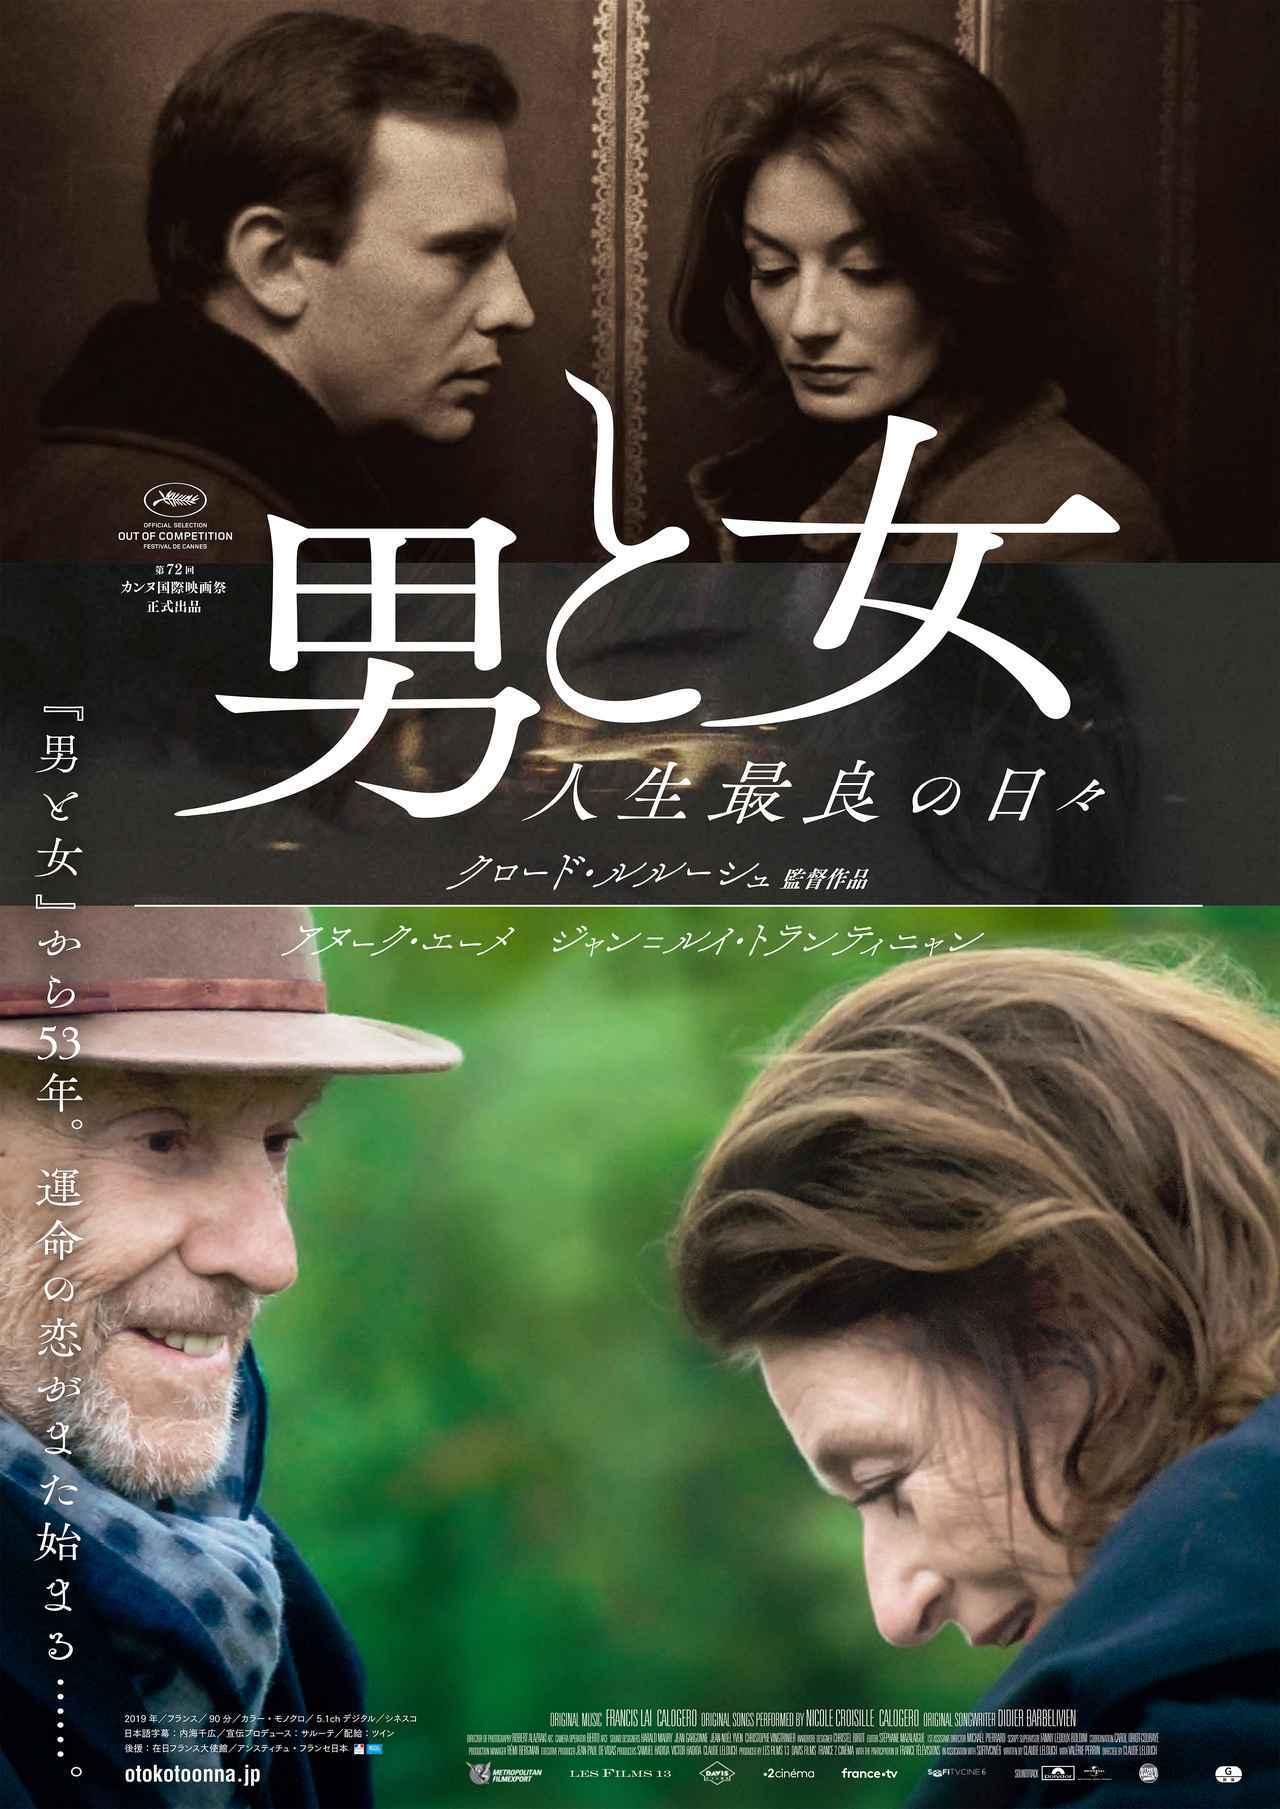 画像3: (C)2019 ‒ Davis Films ‒ Les Films 13